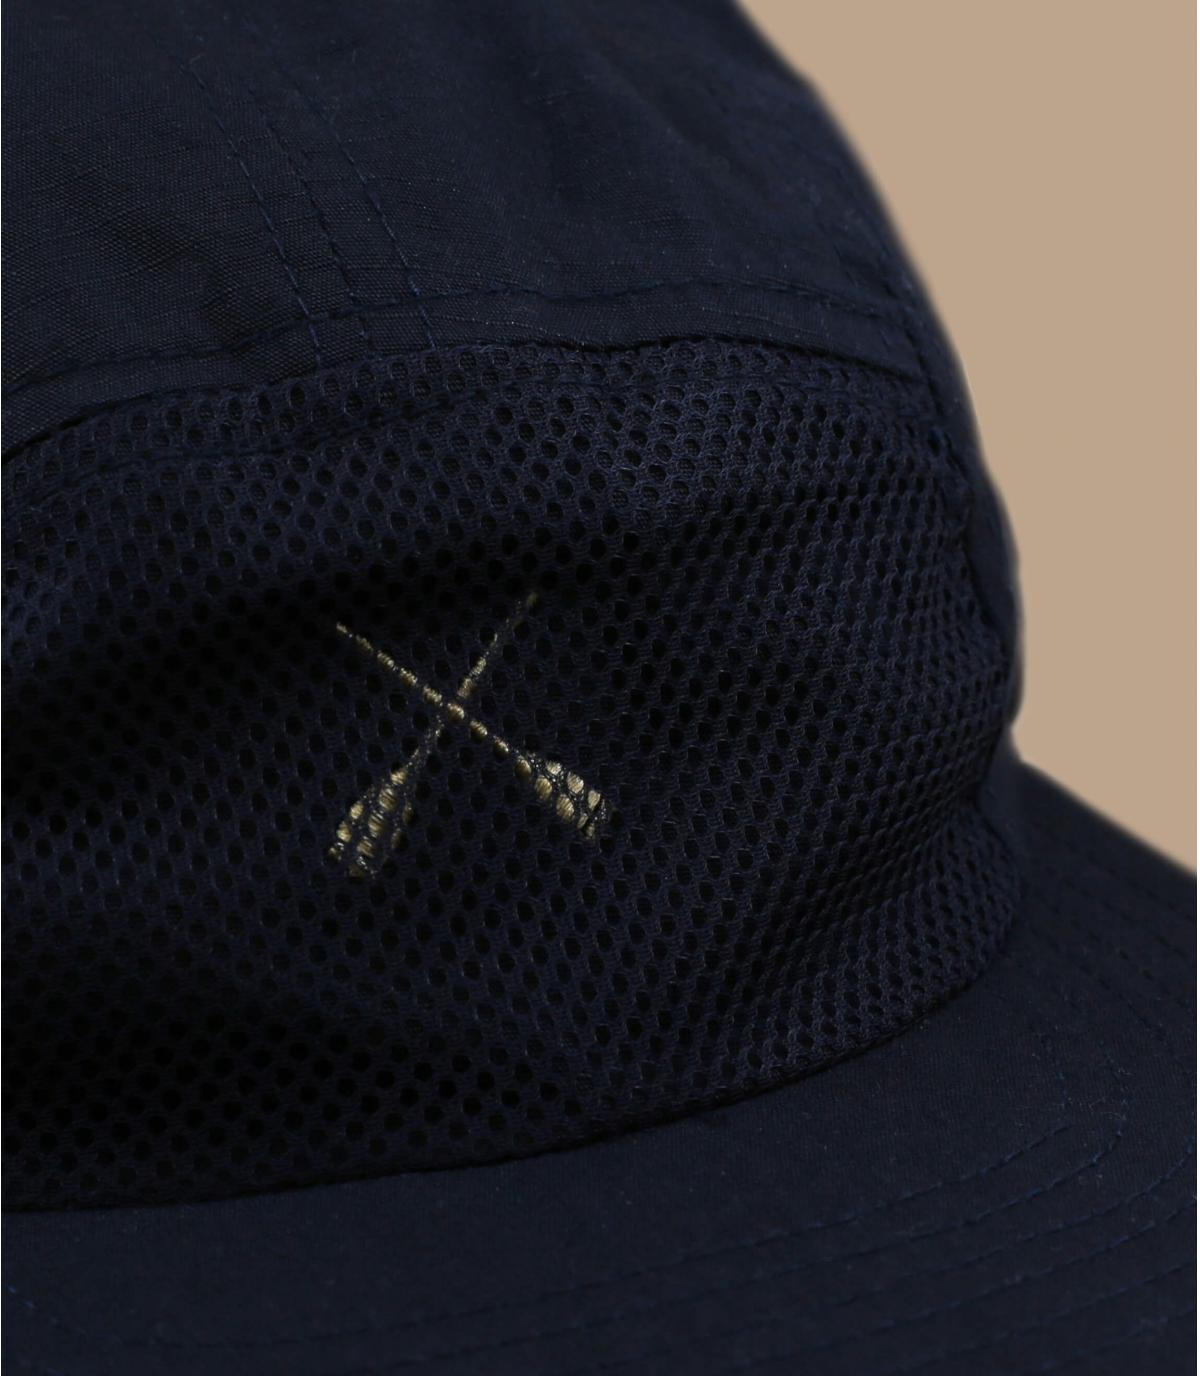 Cappellino 5 pannelli blu navy